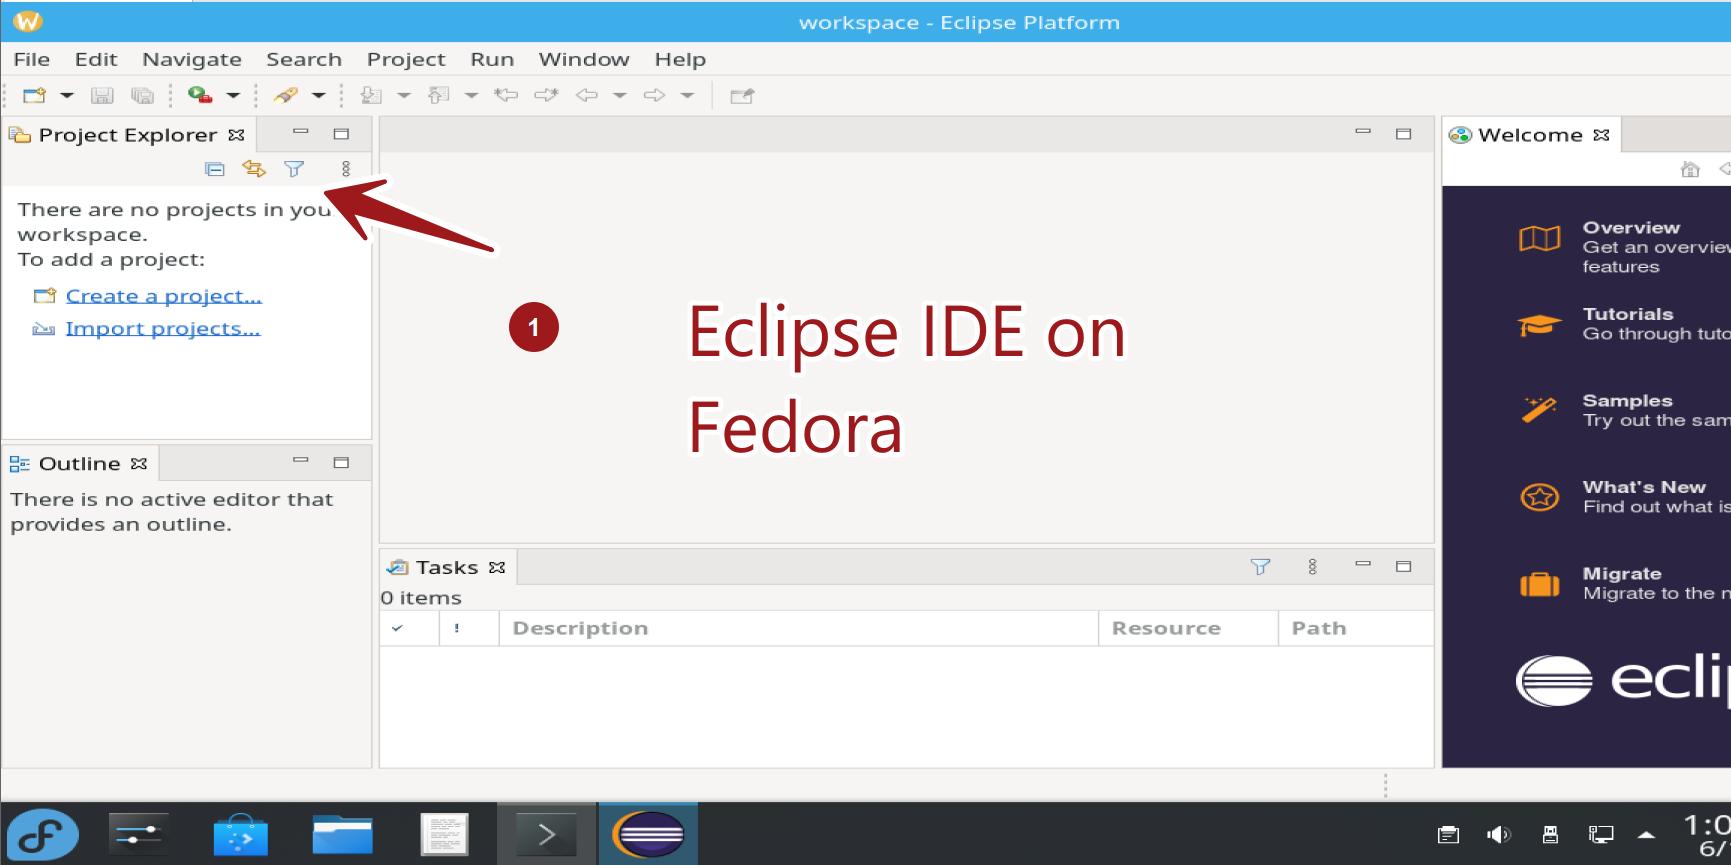 Eclipse IDE on Fedora